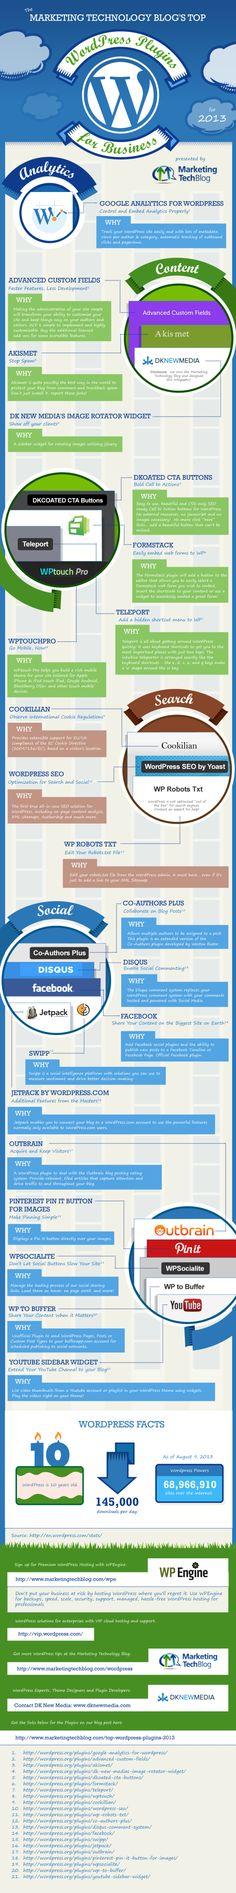 Plugins Wordpress para negocios 2013 #infografia